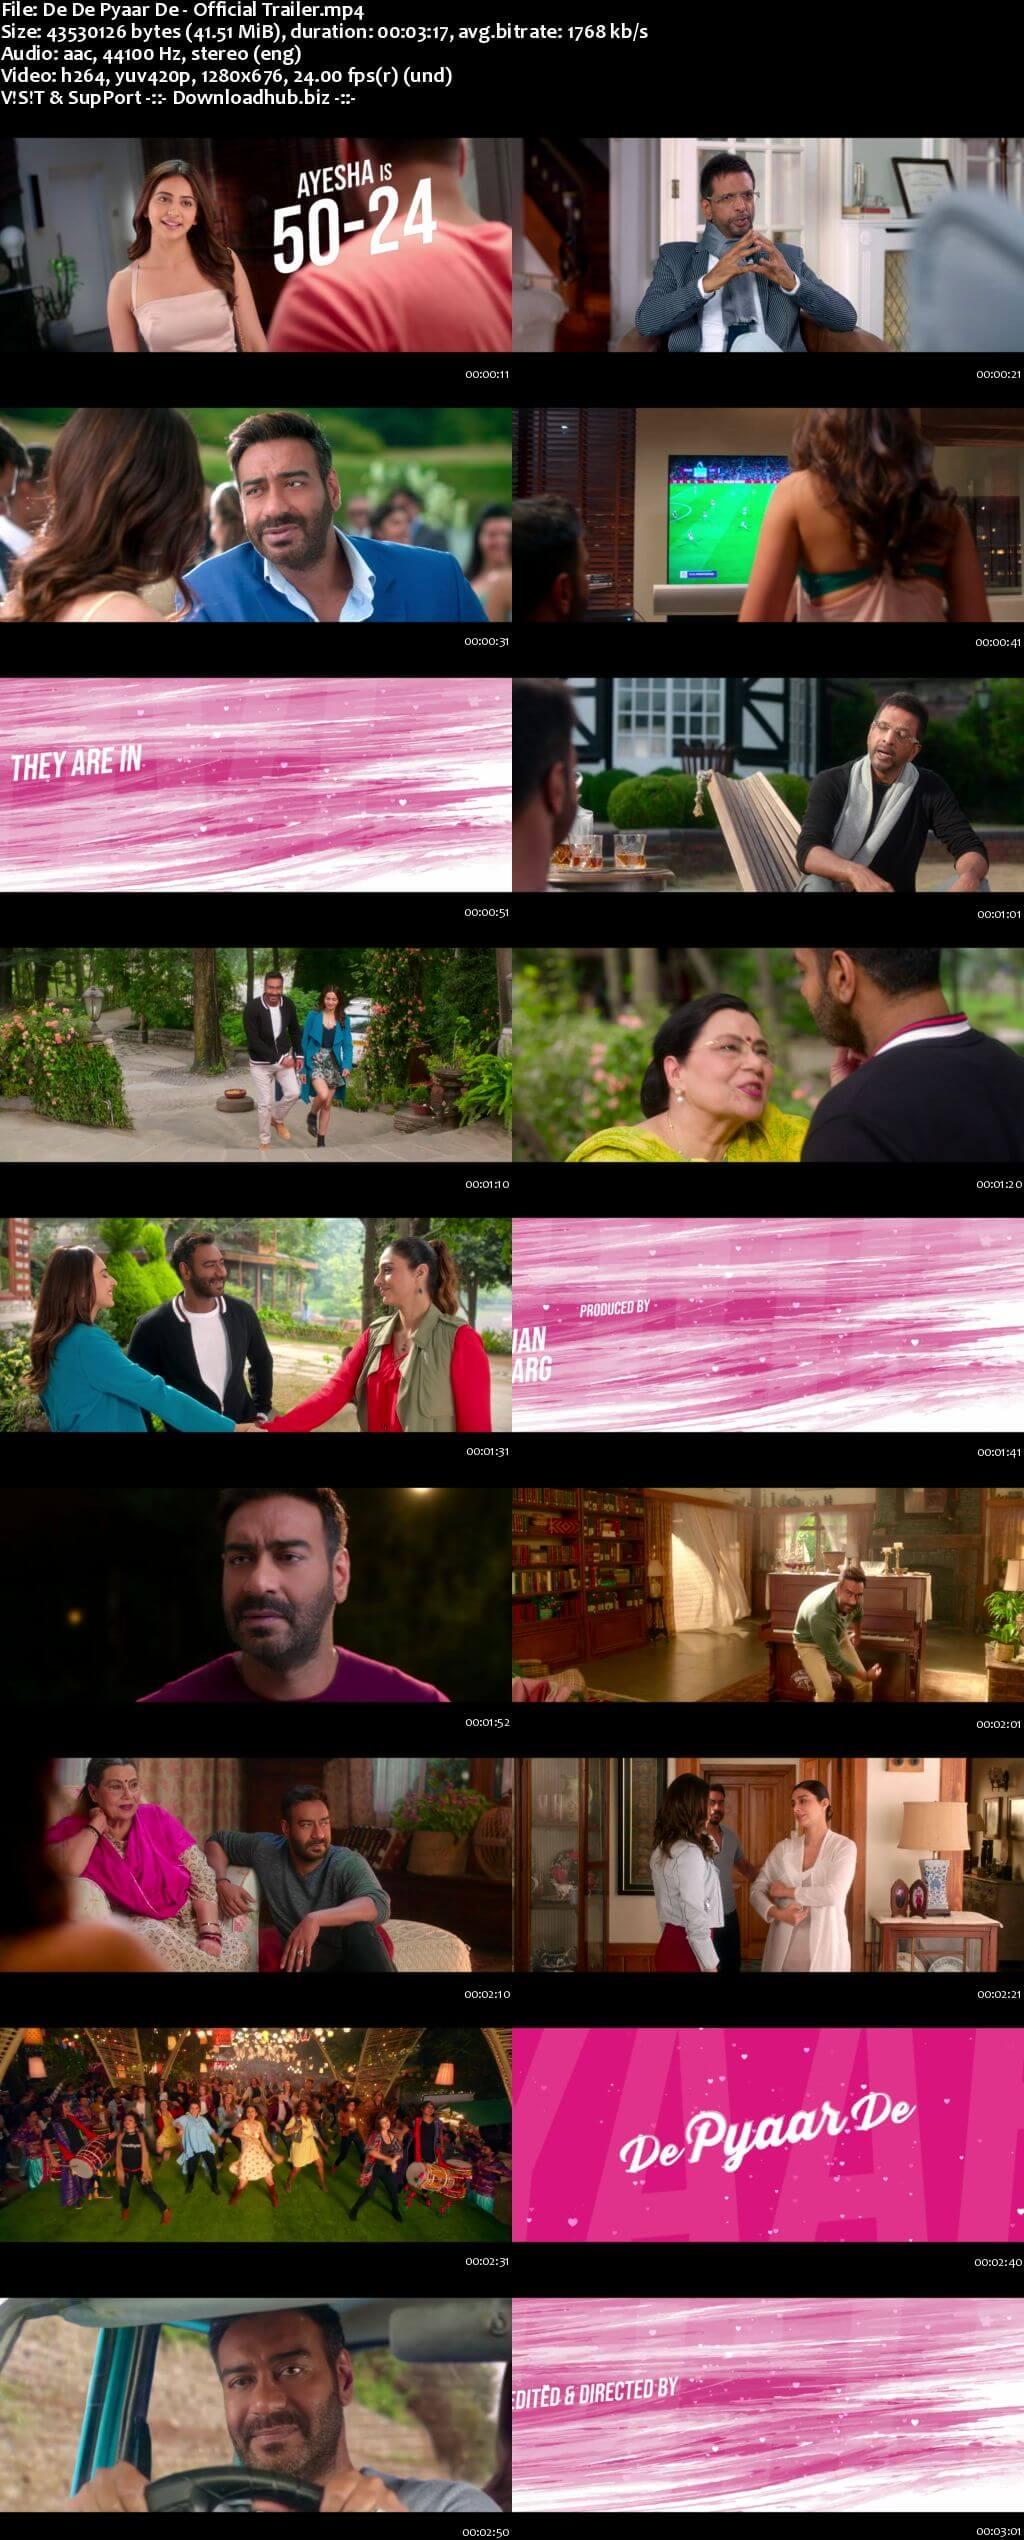 De De Pyaar De 2019 Hindi HD Official Trailer 720p